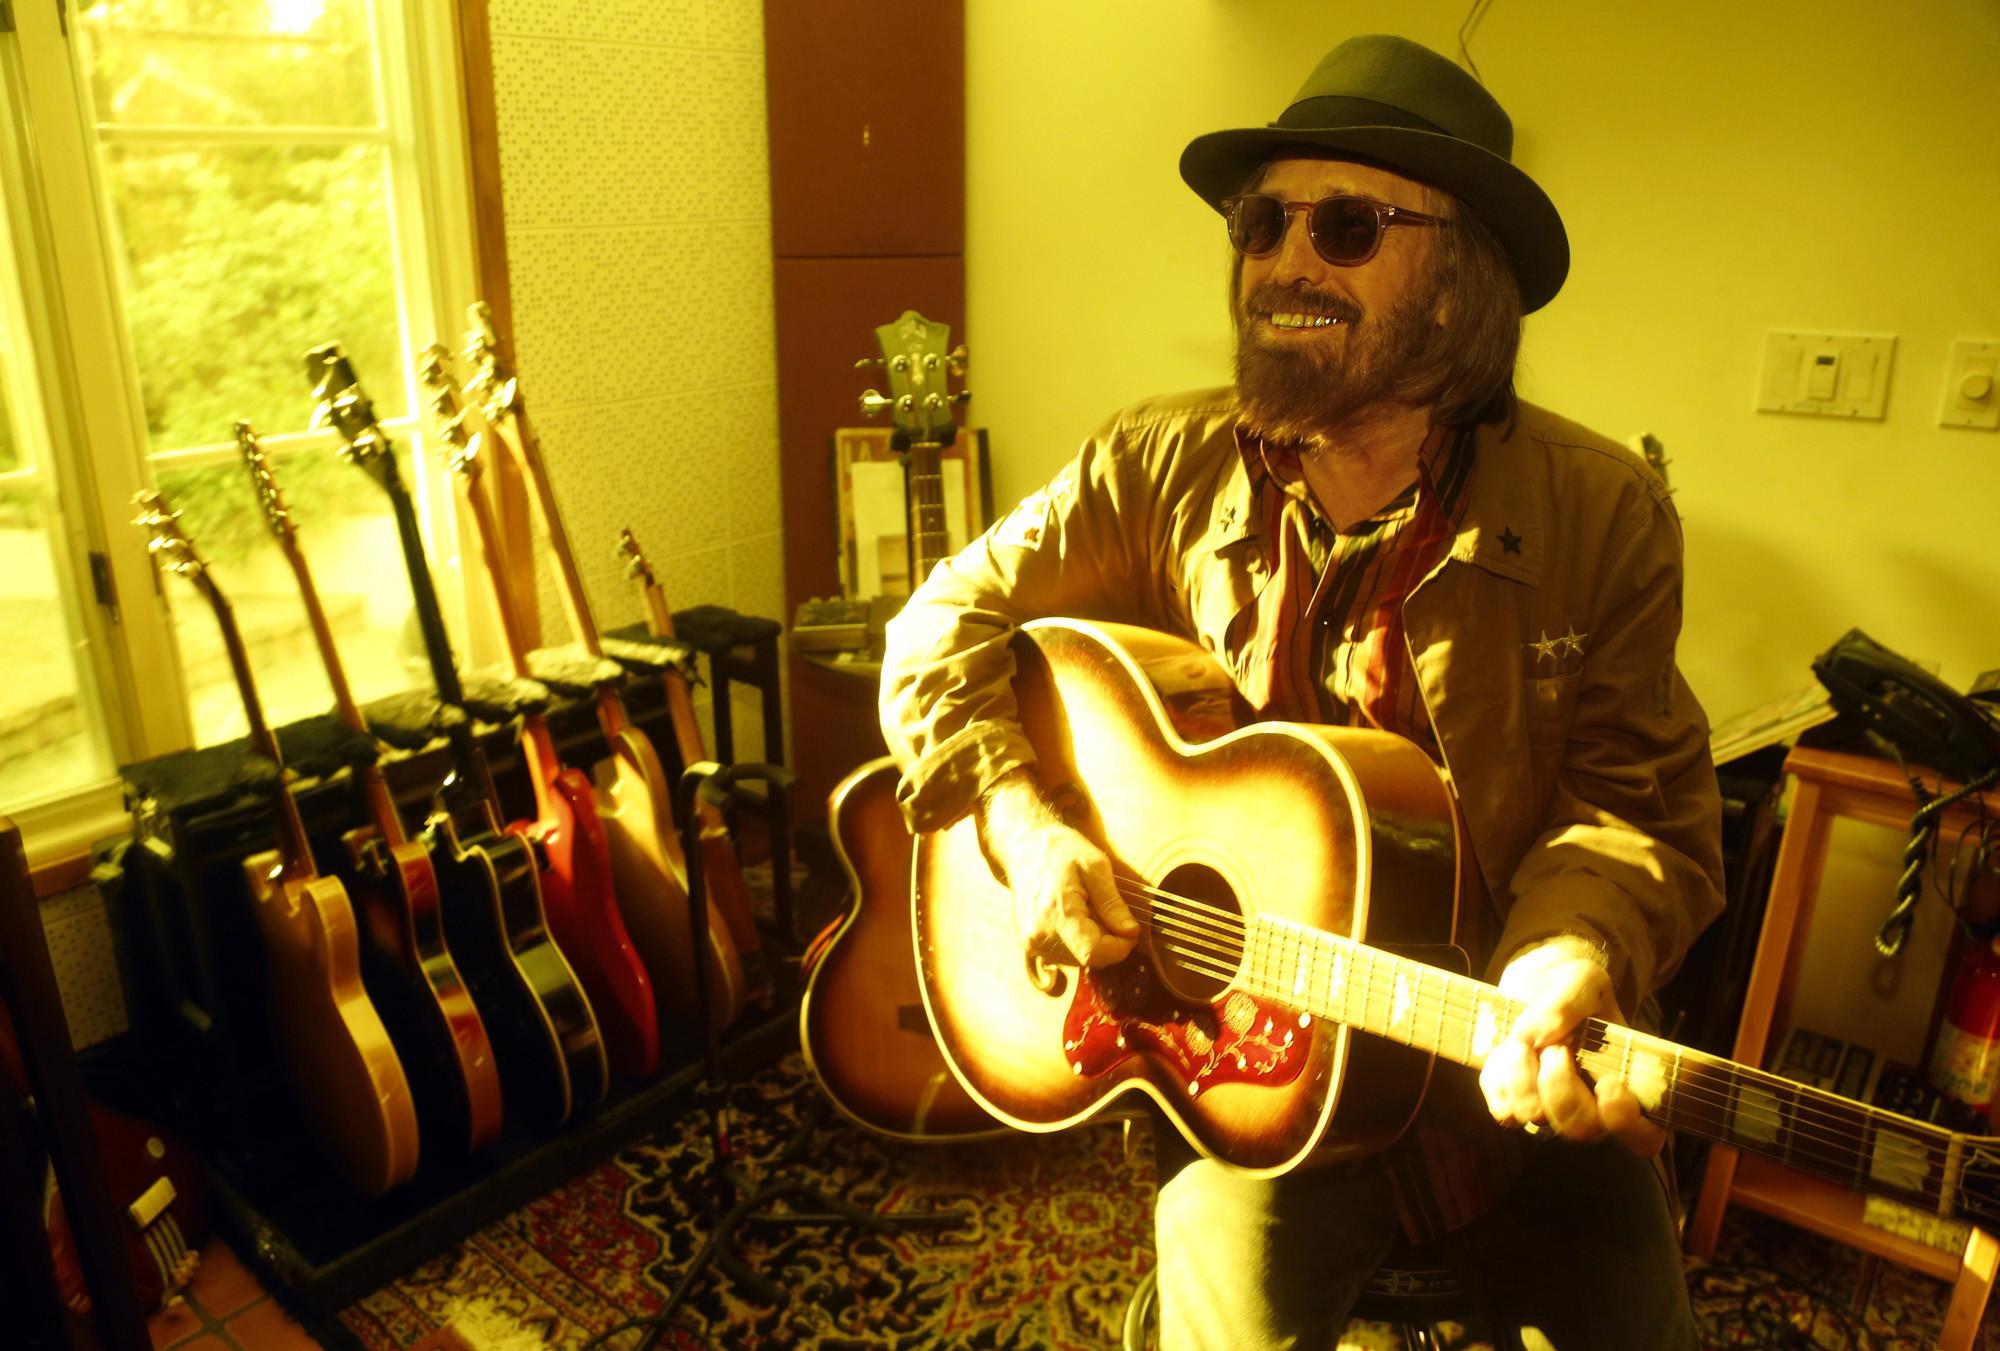 Tom Petty in his home studio.